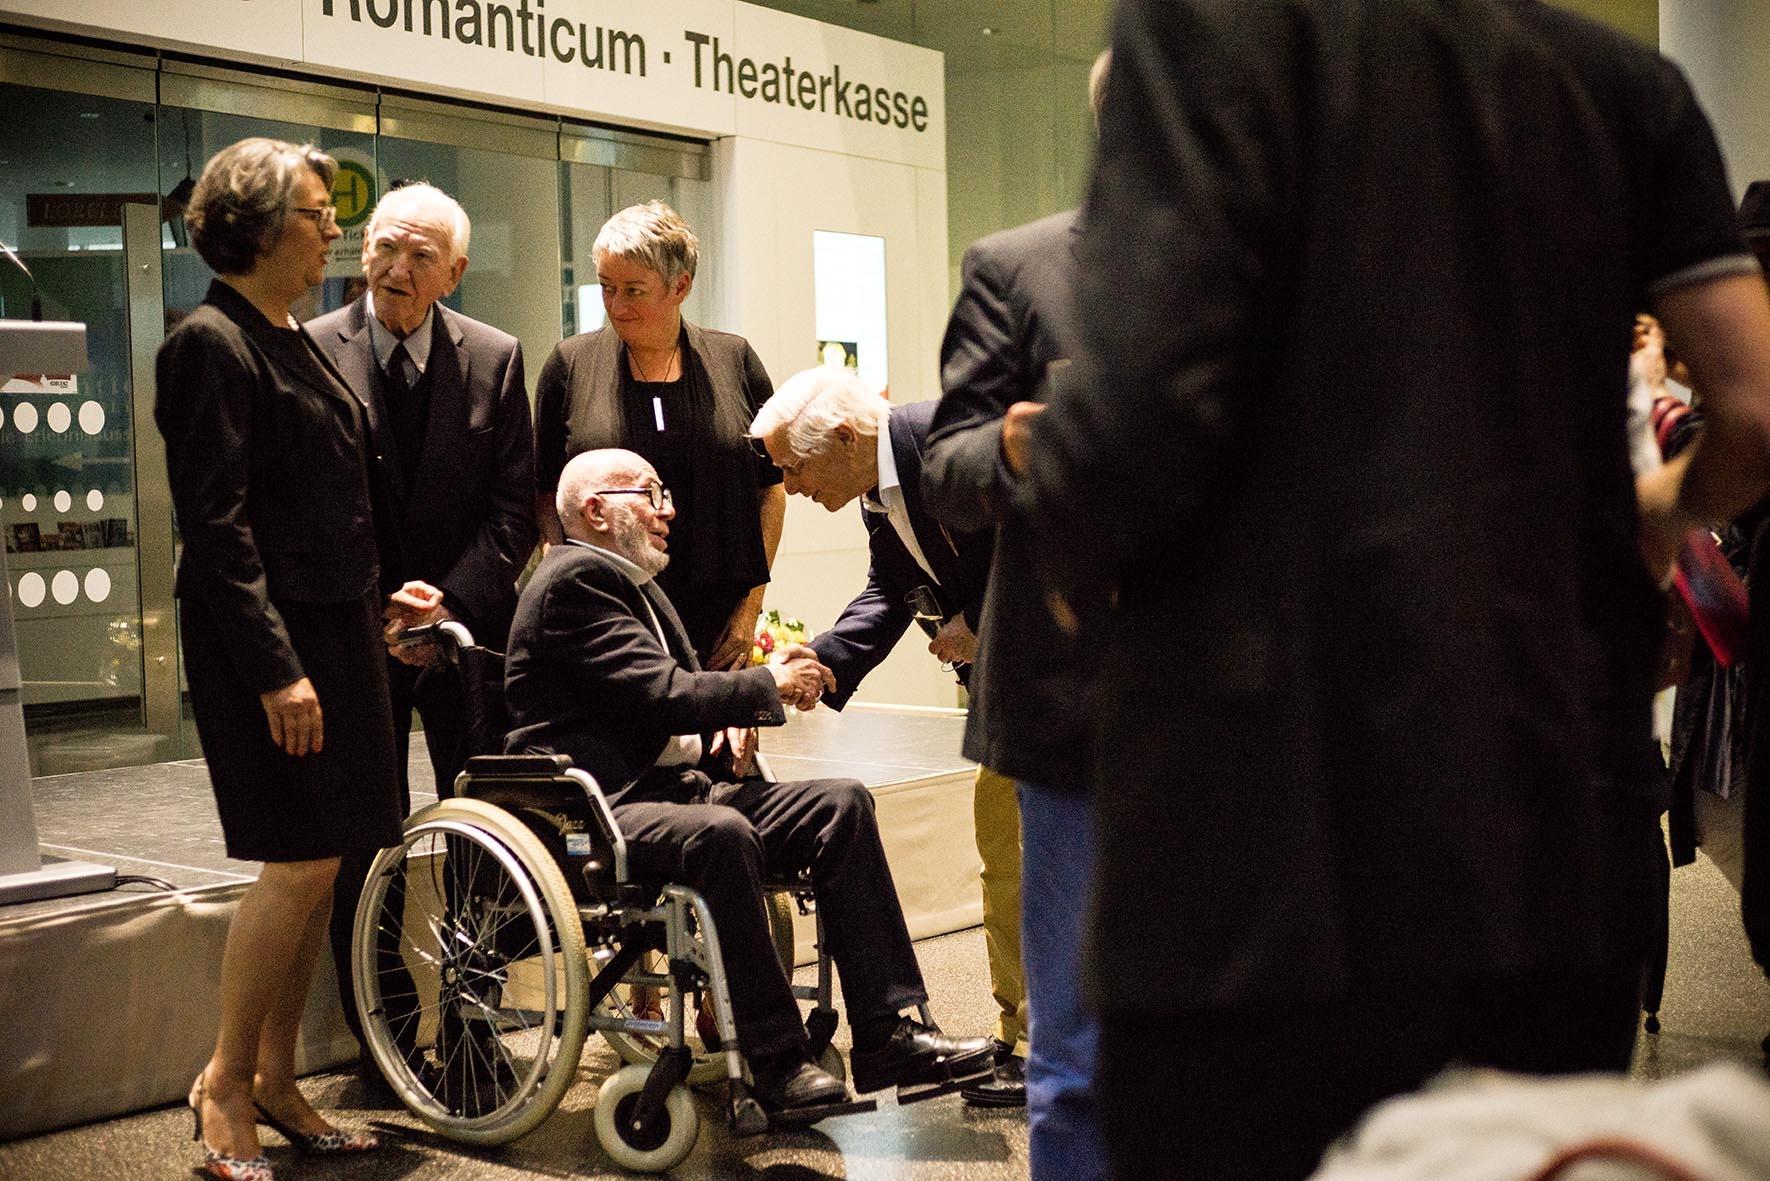 Preisverleihung 2016 heijo + gisela hangen-stiftung, fotograph: gaudenz bock